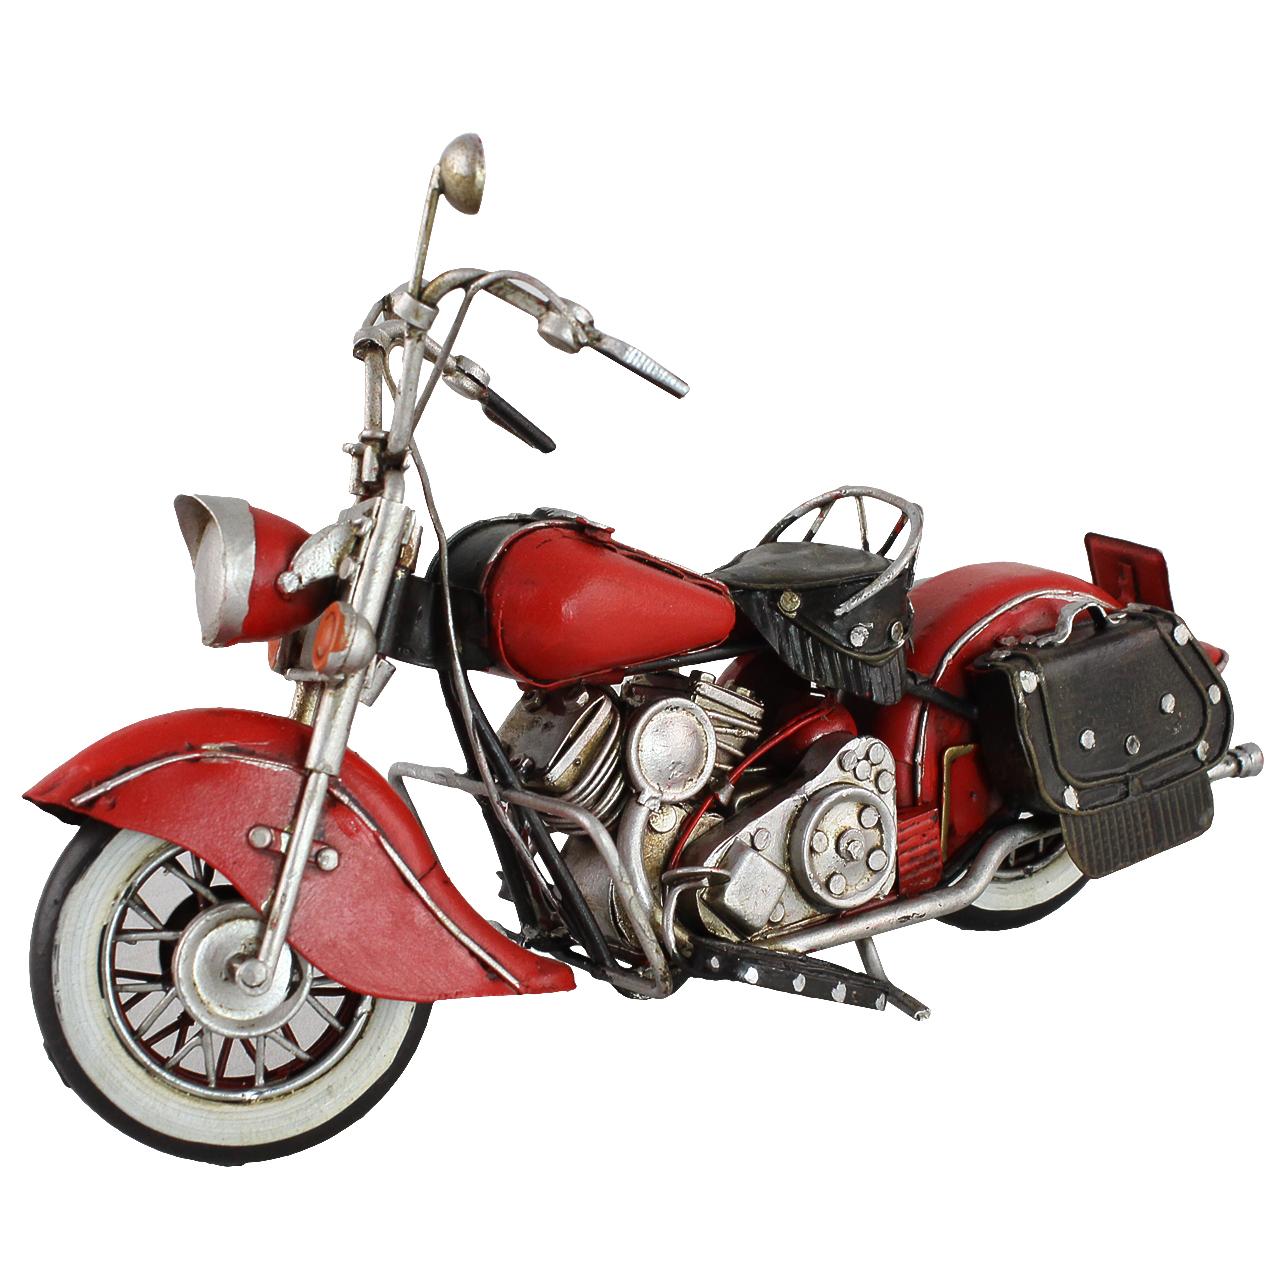 Macheta Motocicleta Din Metal Rosu 23 Cm